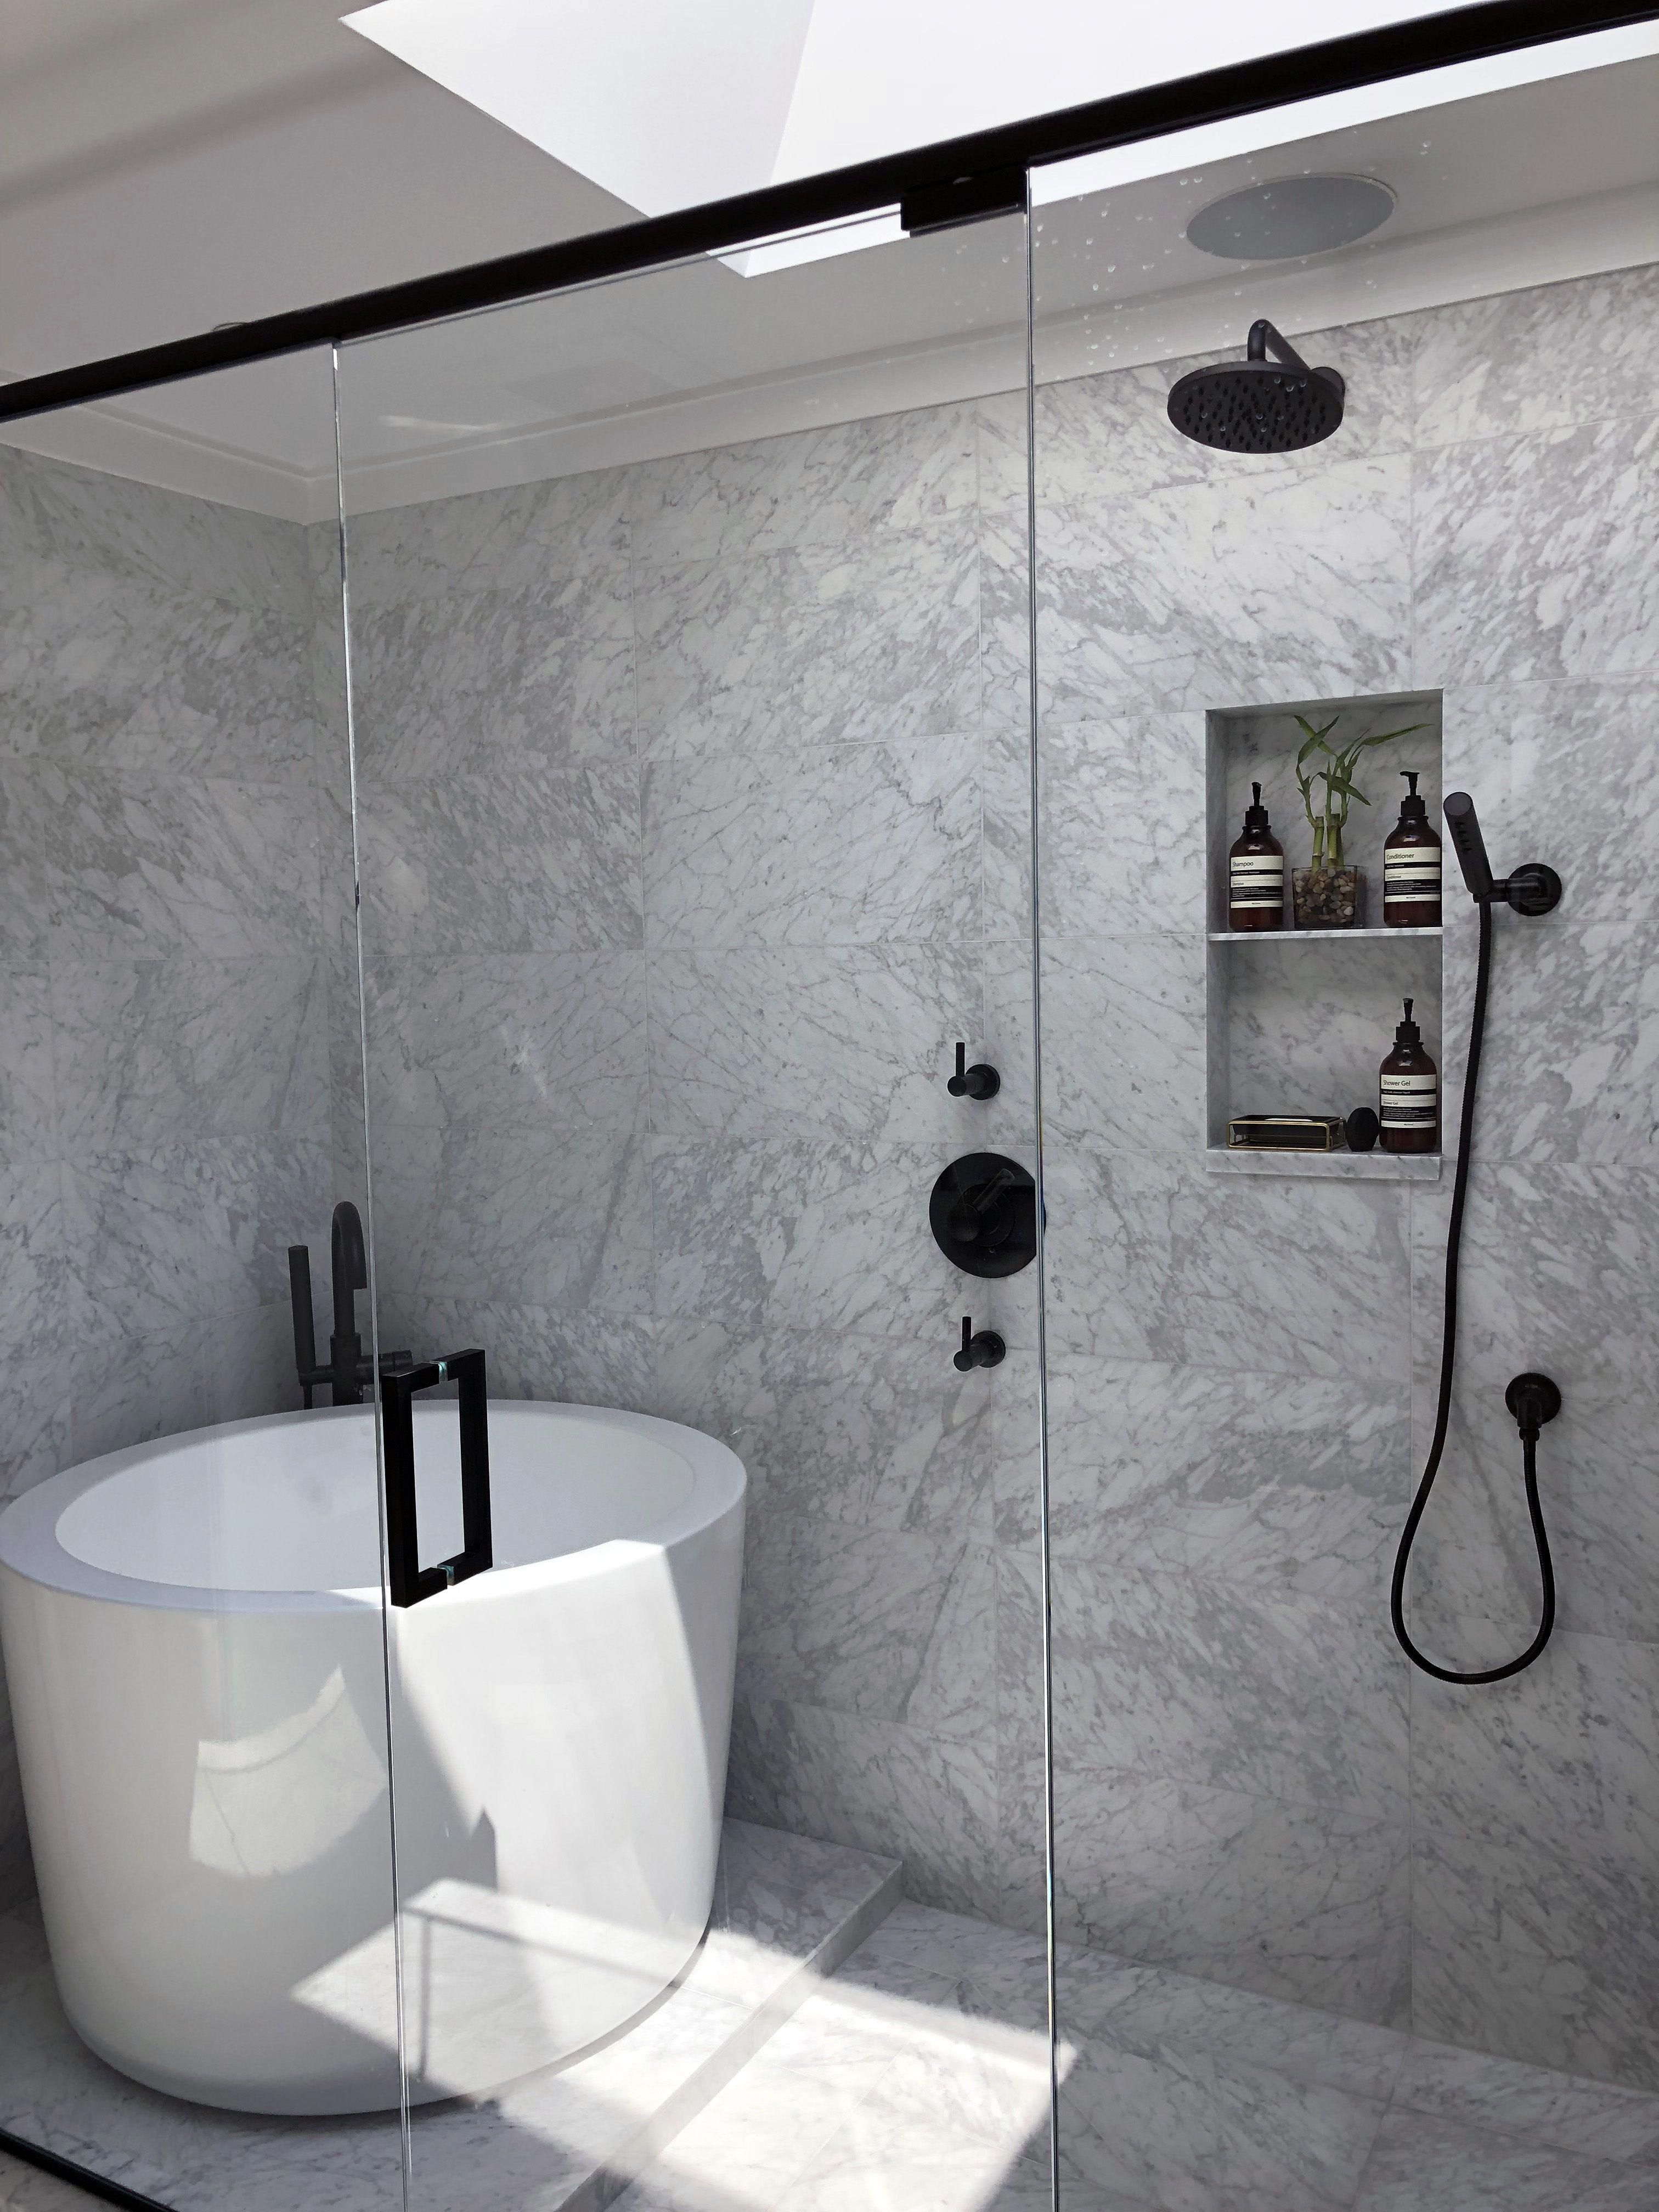 37 Gorgeous Bathroom Tub Shower Combo Design Ideas In 2020 Bathroom Tub Shower Combo Bathroom Tub Shower Bathroom Design